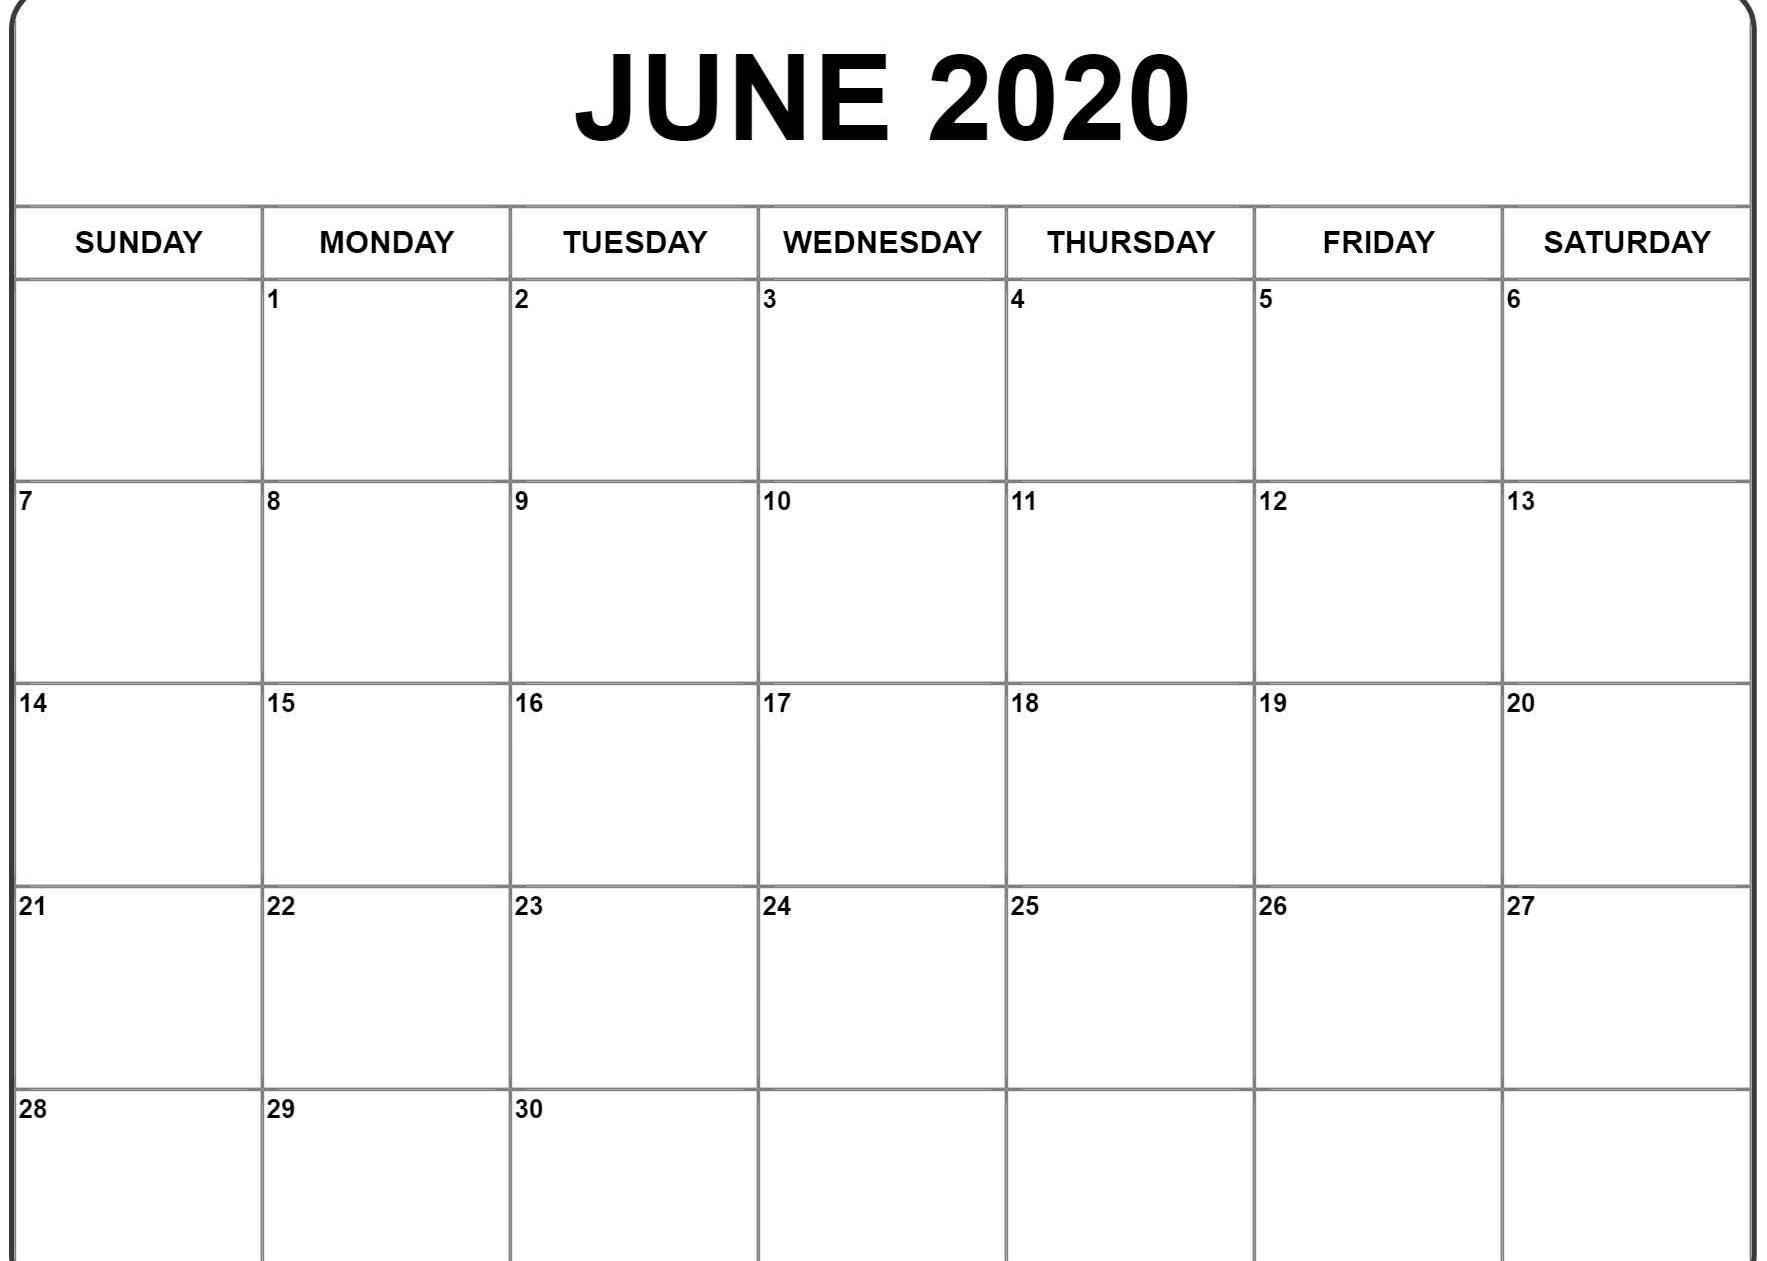 001 Impressive Printable Calendar Template June 2020 Photo  FreeFull